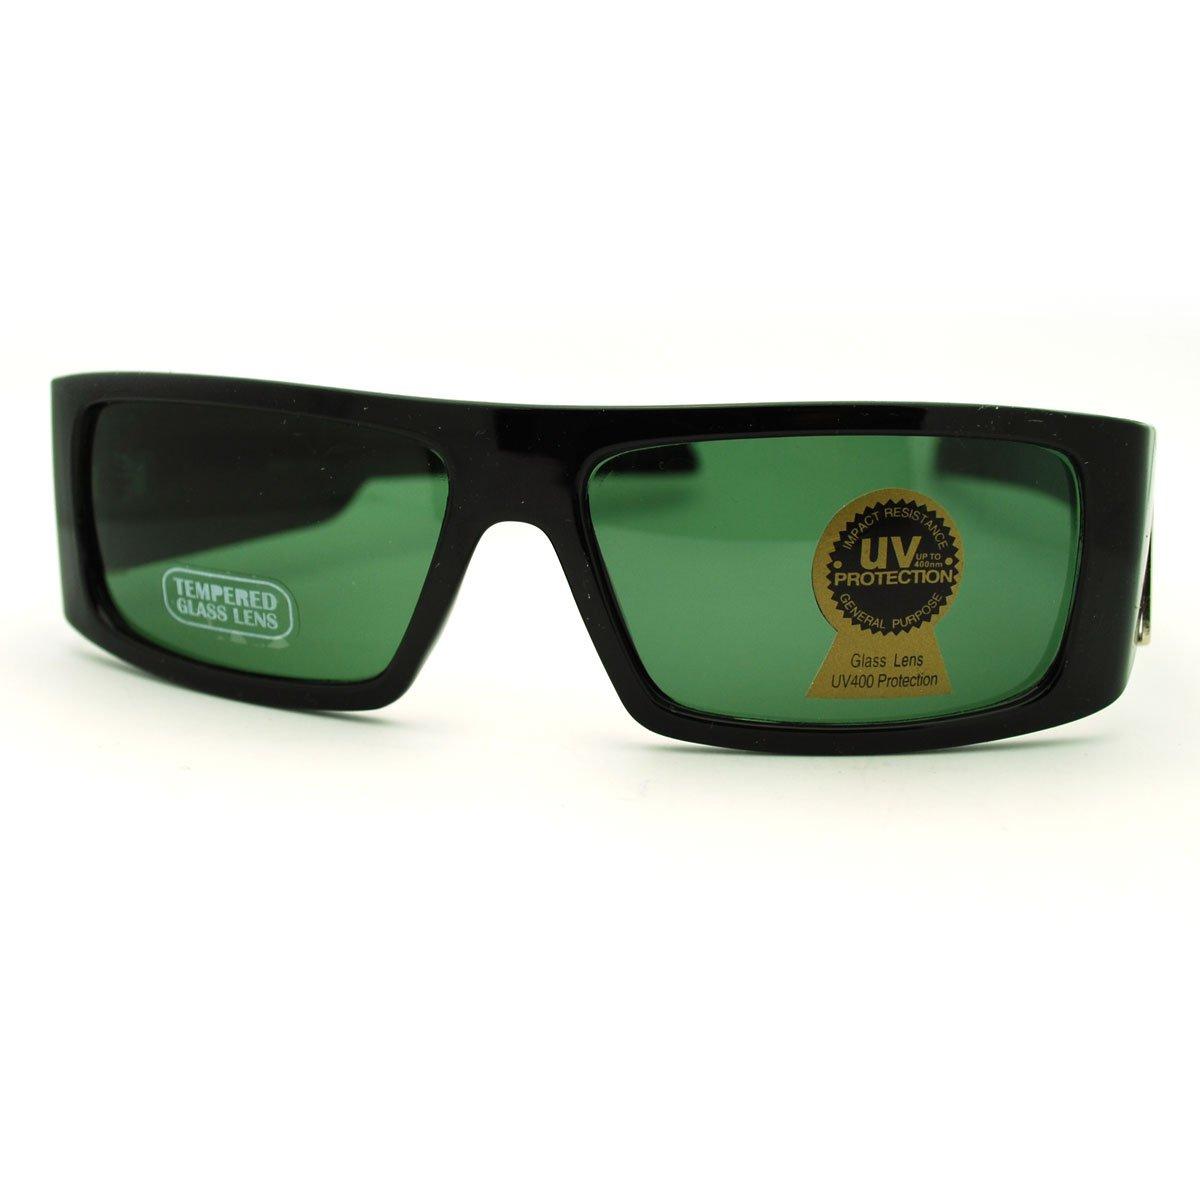 Glass Lens Sunglasses Mens Flat Top Rectangular USA Frame